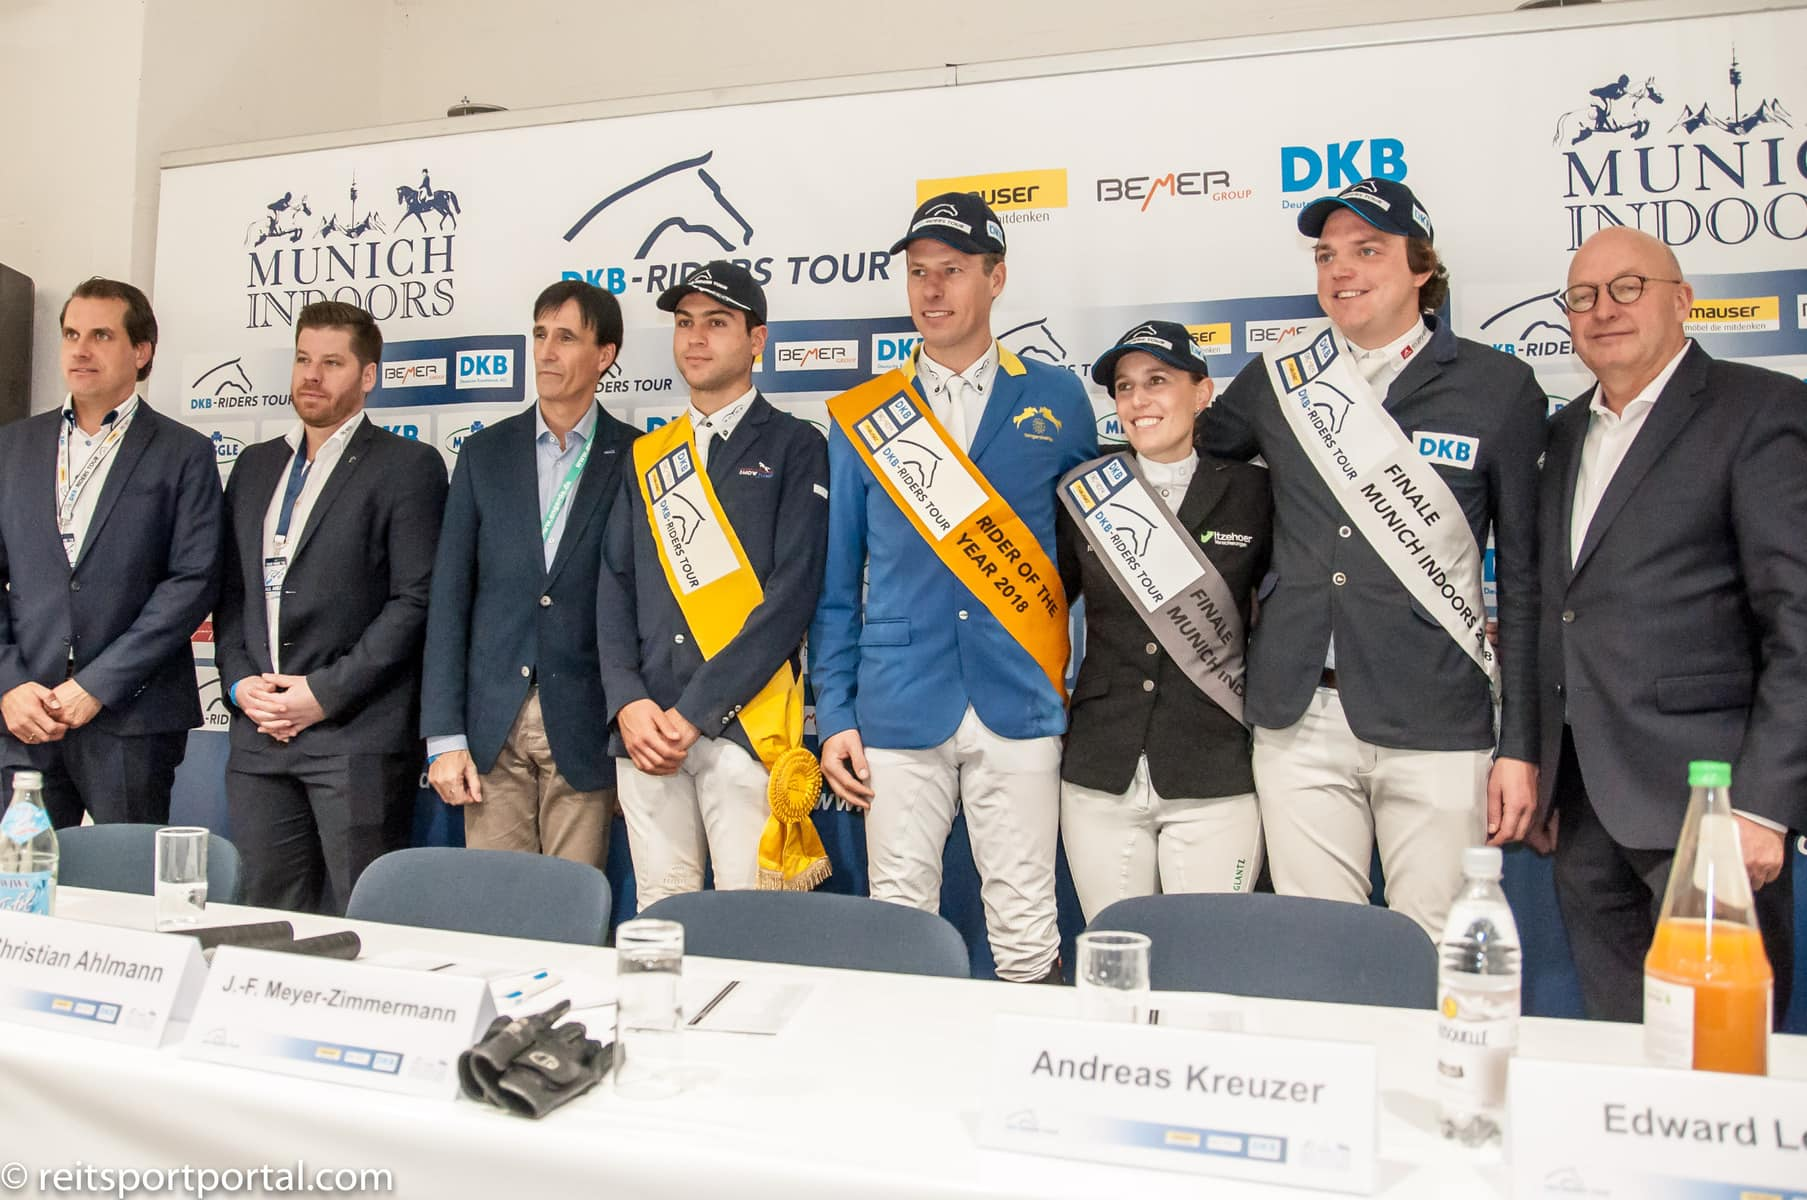 DKB-Riders Tour Pressekonferenz